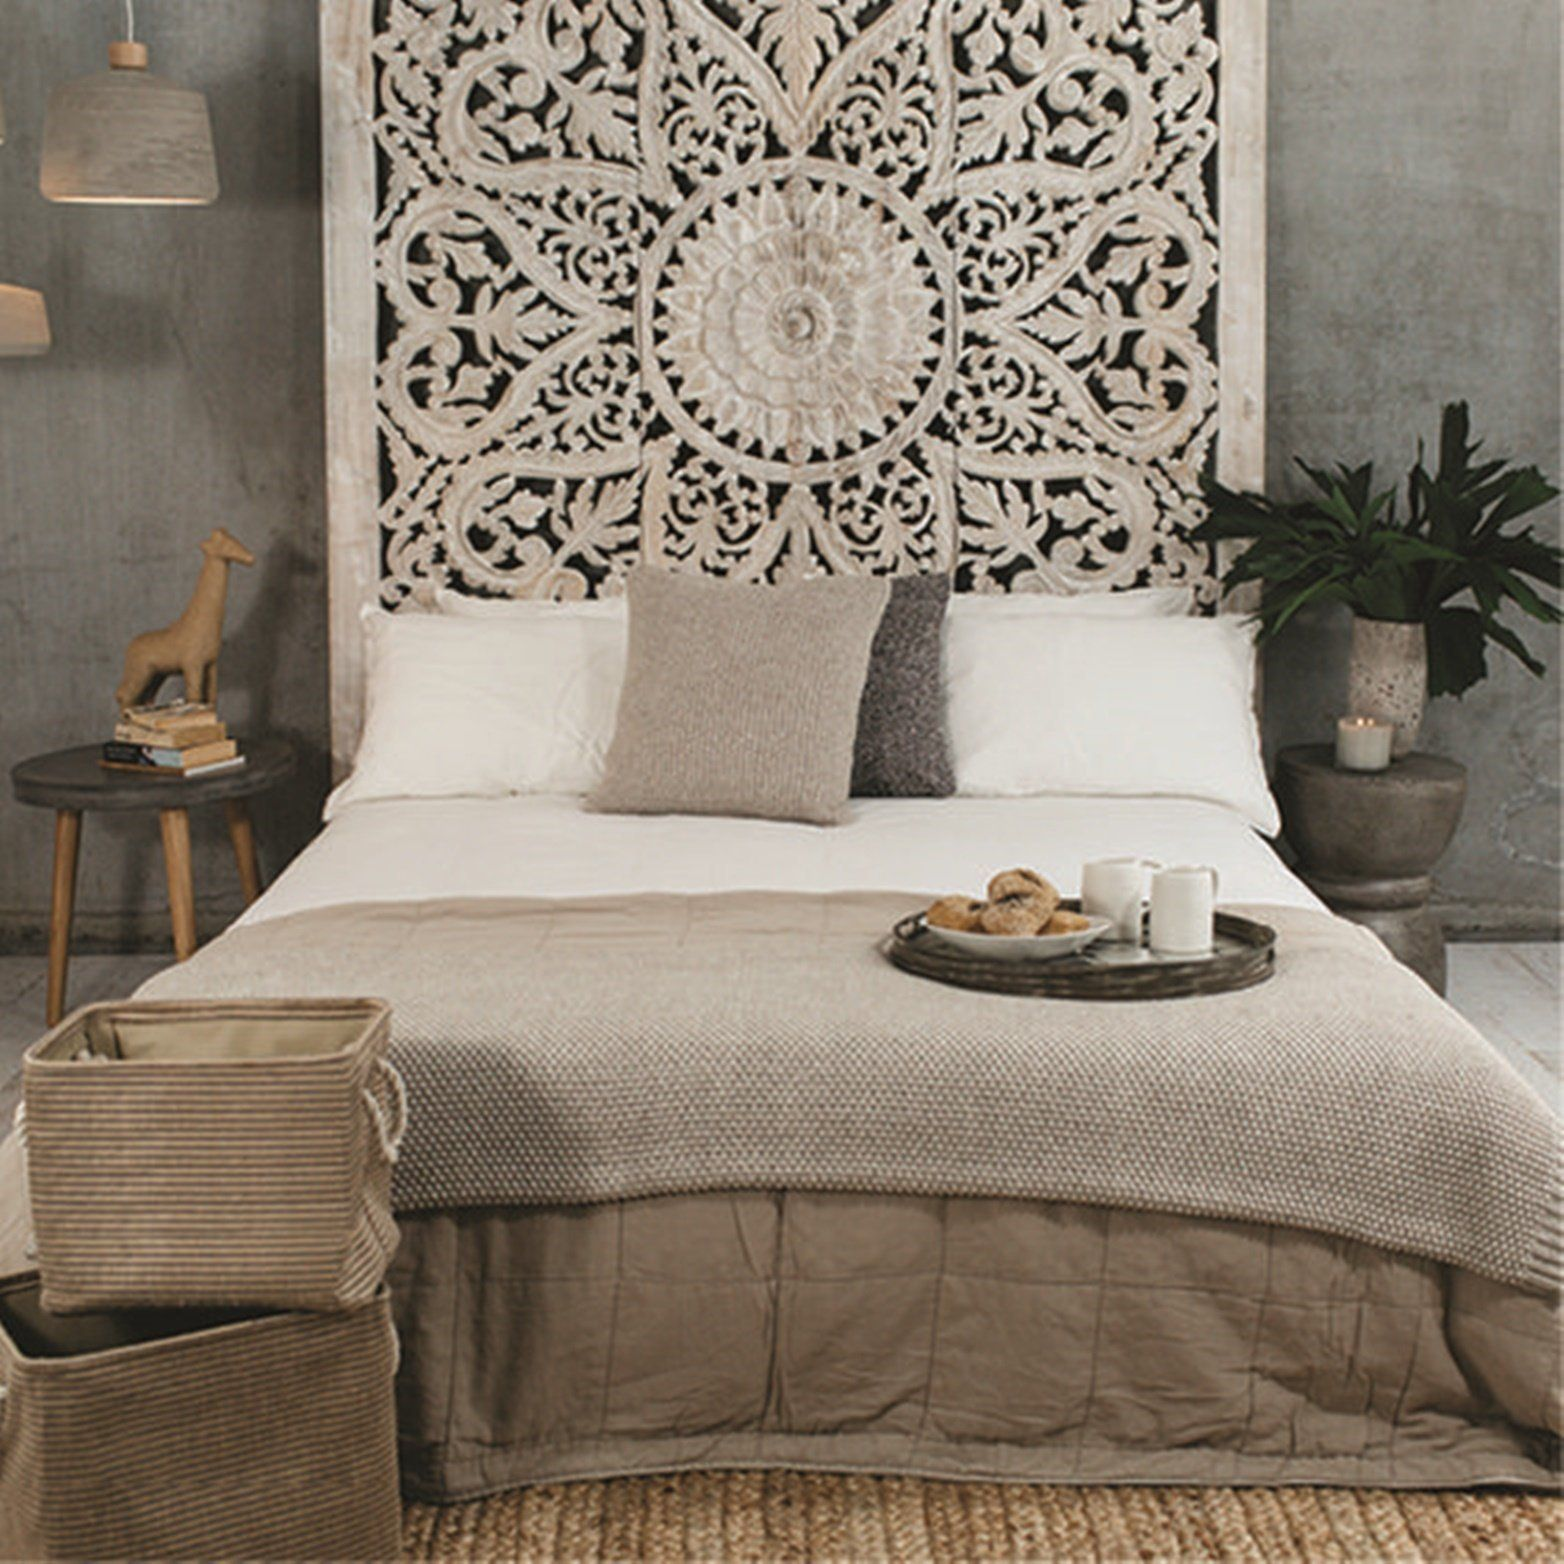 71 Large Wall Art King Size Bed Sculpture Bohemian Headboard Decorative Flower Mandala Wooden Hand Craved Teak Wood Panel White Sypialnie Wnetrza Sypialnia